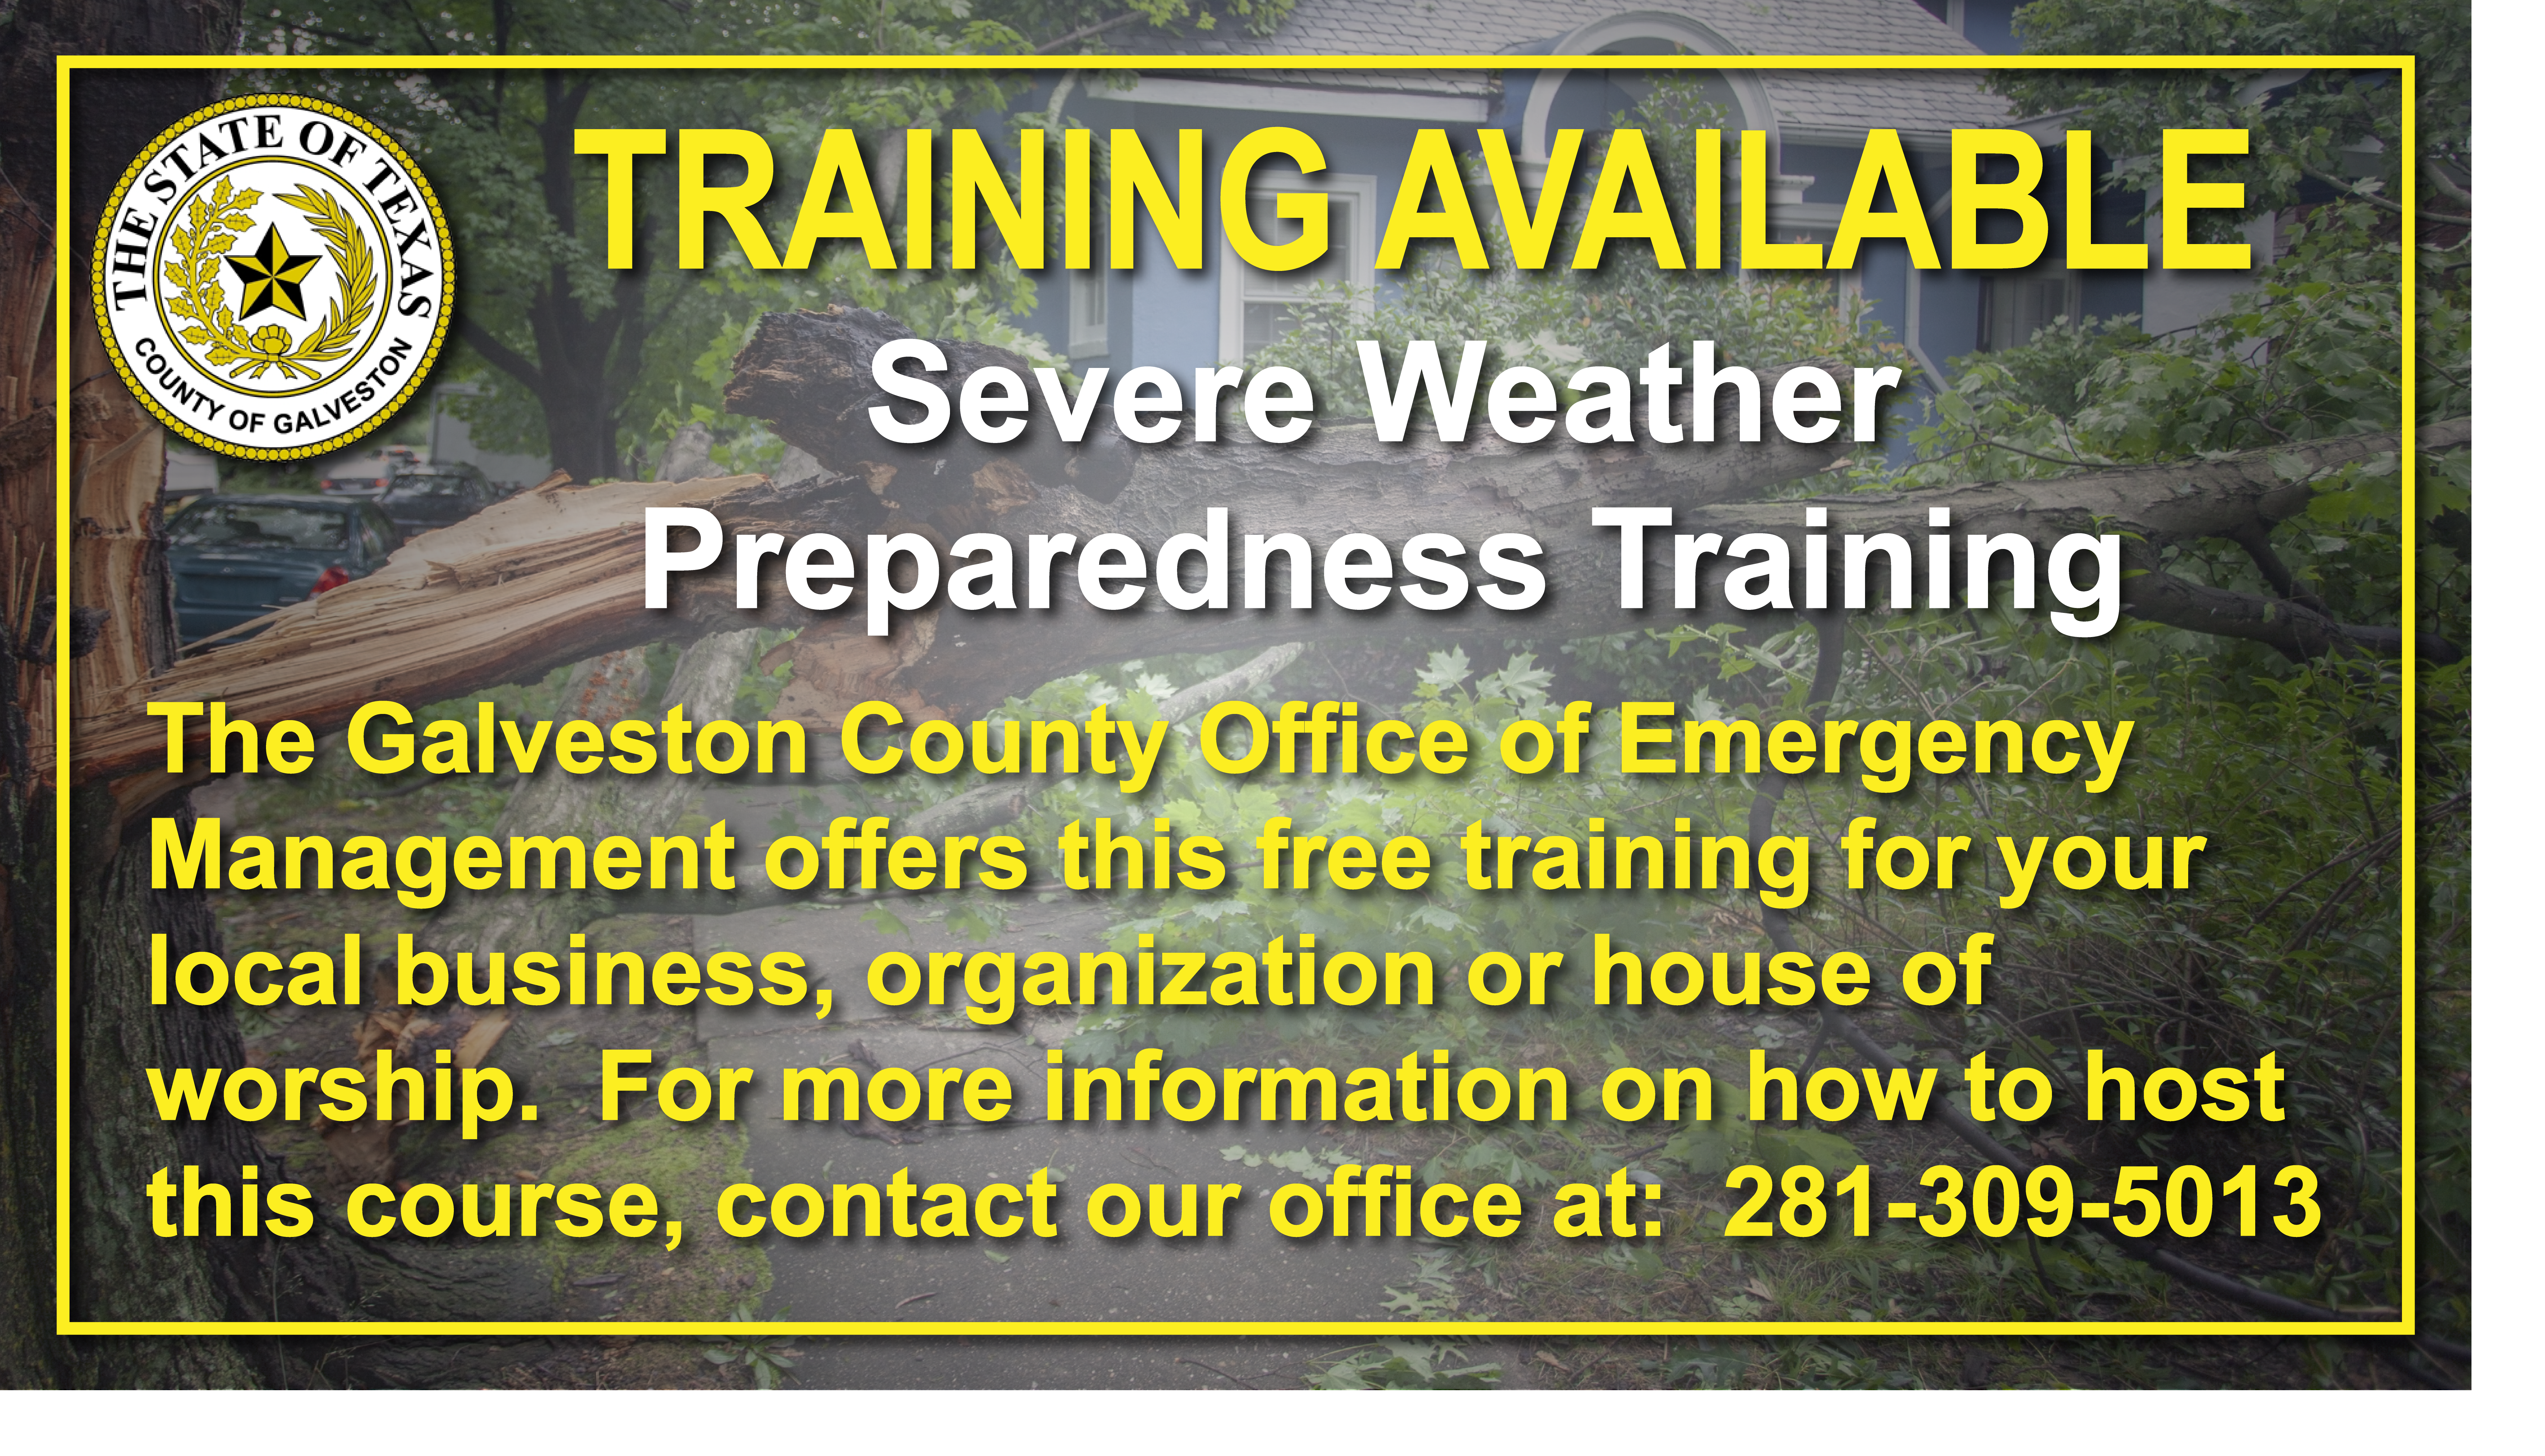 Severe Weather Preparedness Training